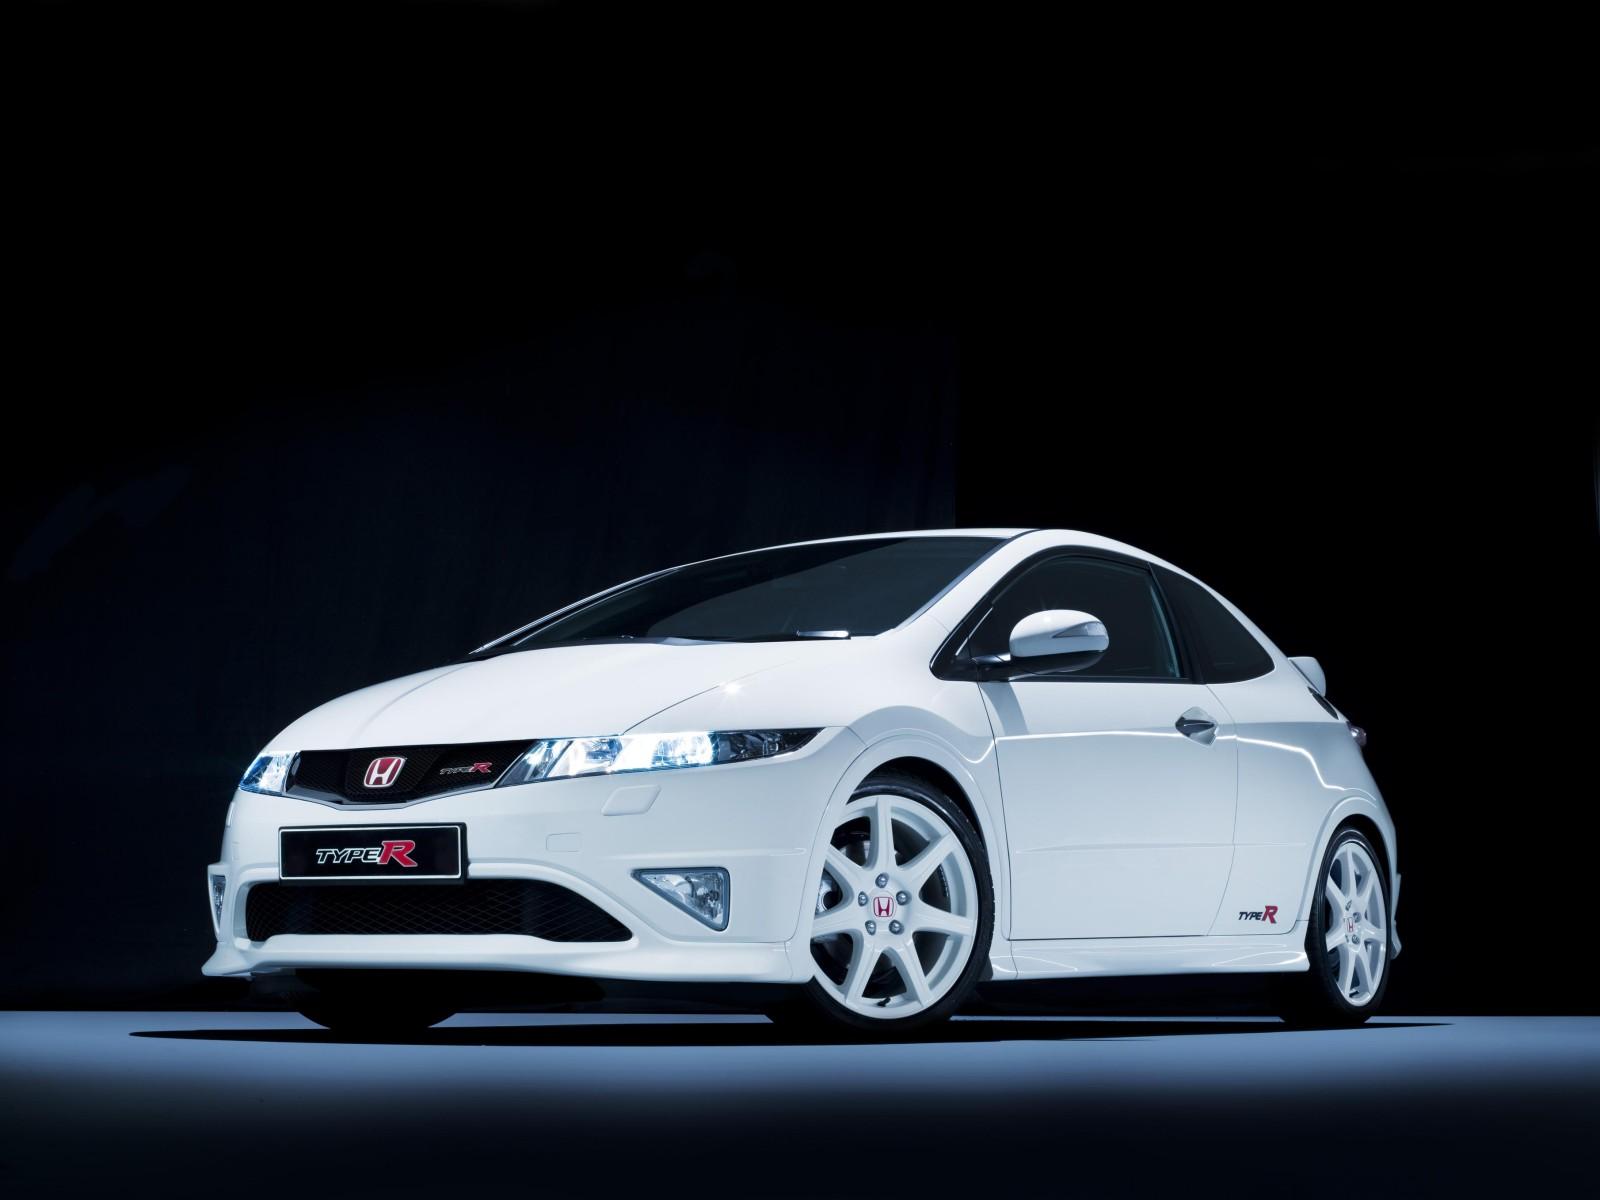 http://3.bp.blogspot.com/-ROYWTbPo5lk/Ta9C-jYjSYI/AAAAAAAAOhA/Wn96J_Bw7e8/s1600/2009-Honda-Civic-Type-R-01-1600x1200.jpg